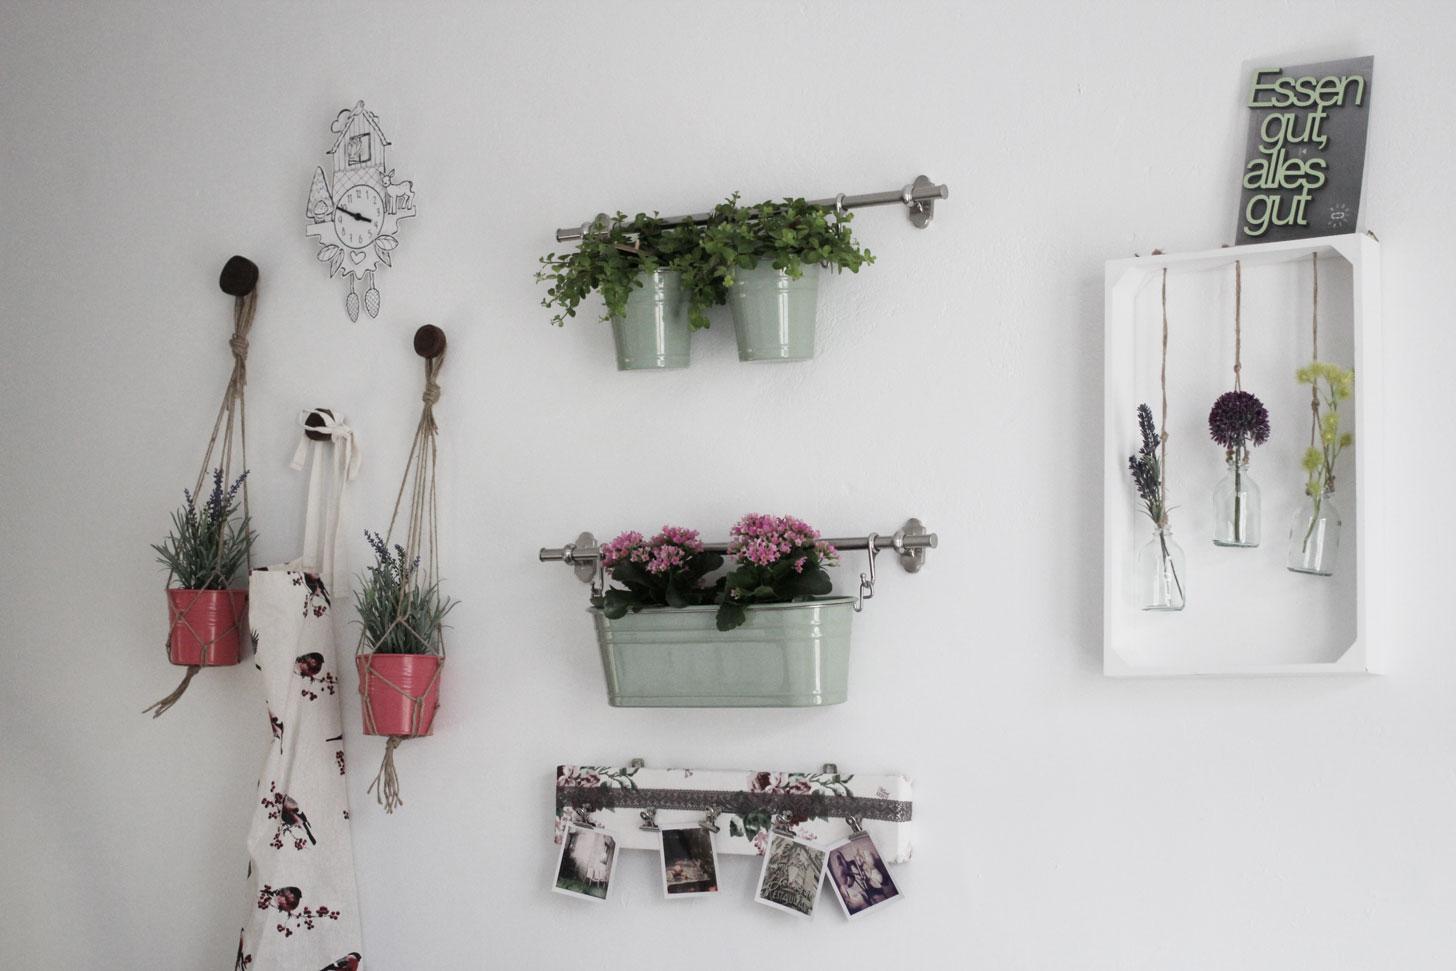 Meine pflanzenwand birdylicious - Diy pflanzenwand ...